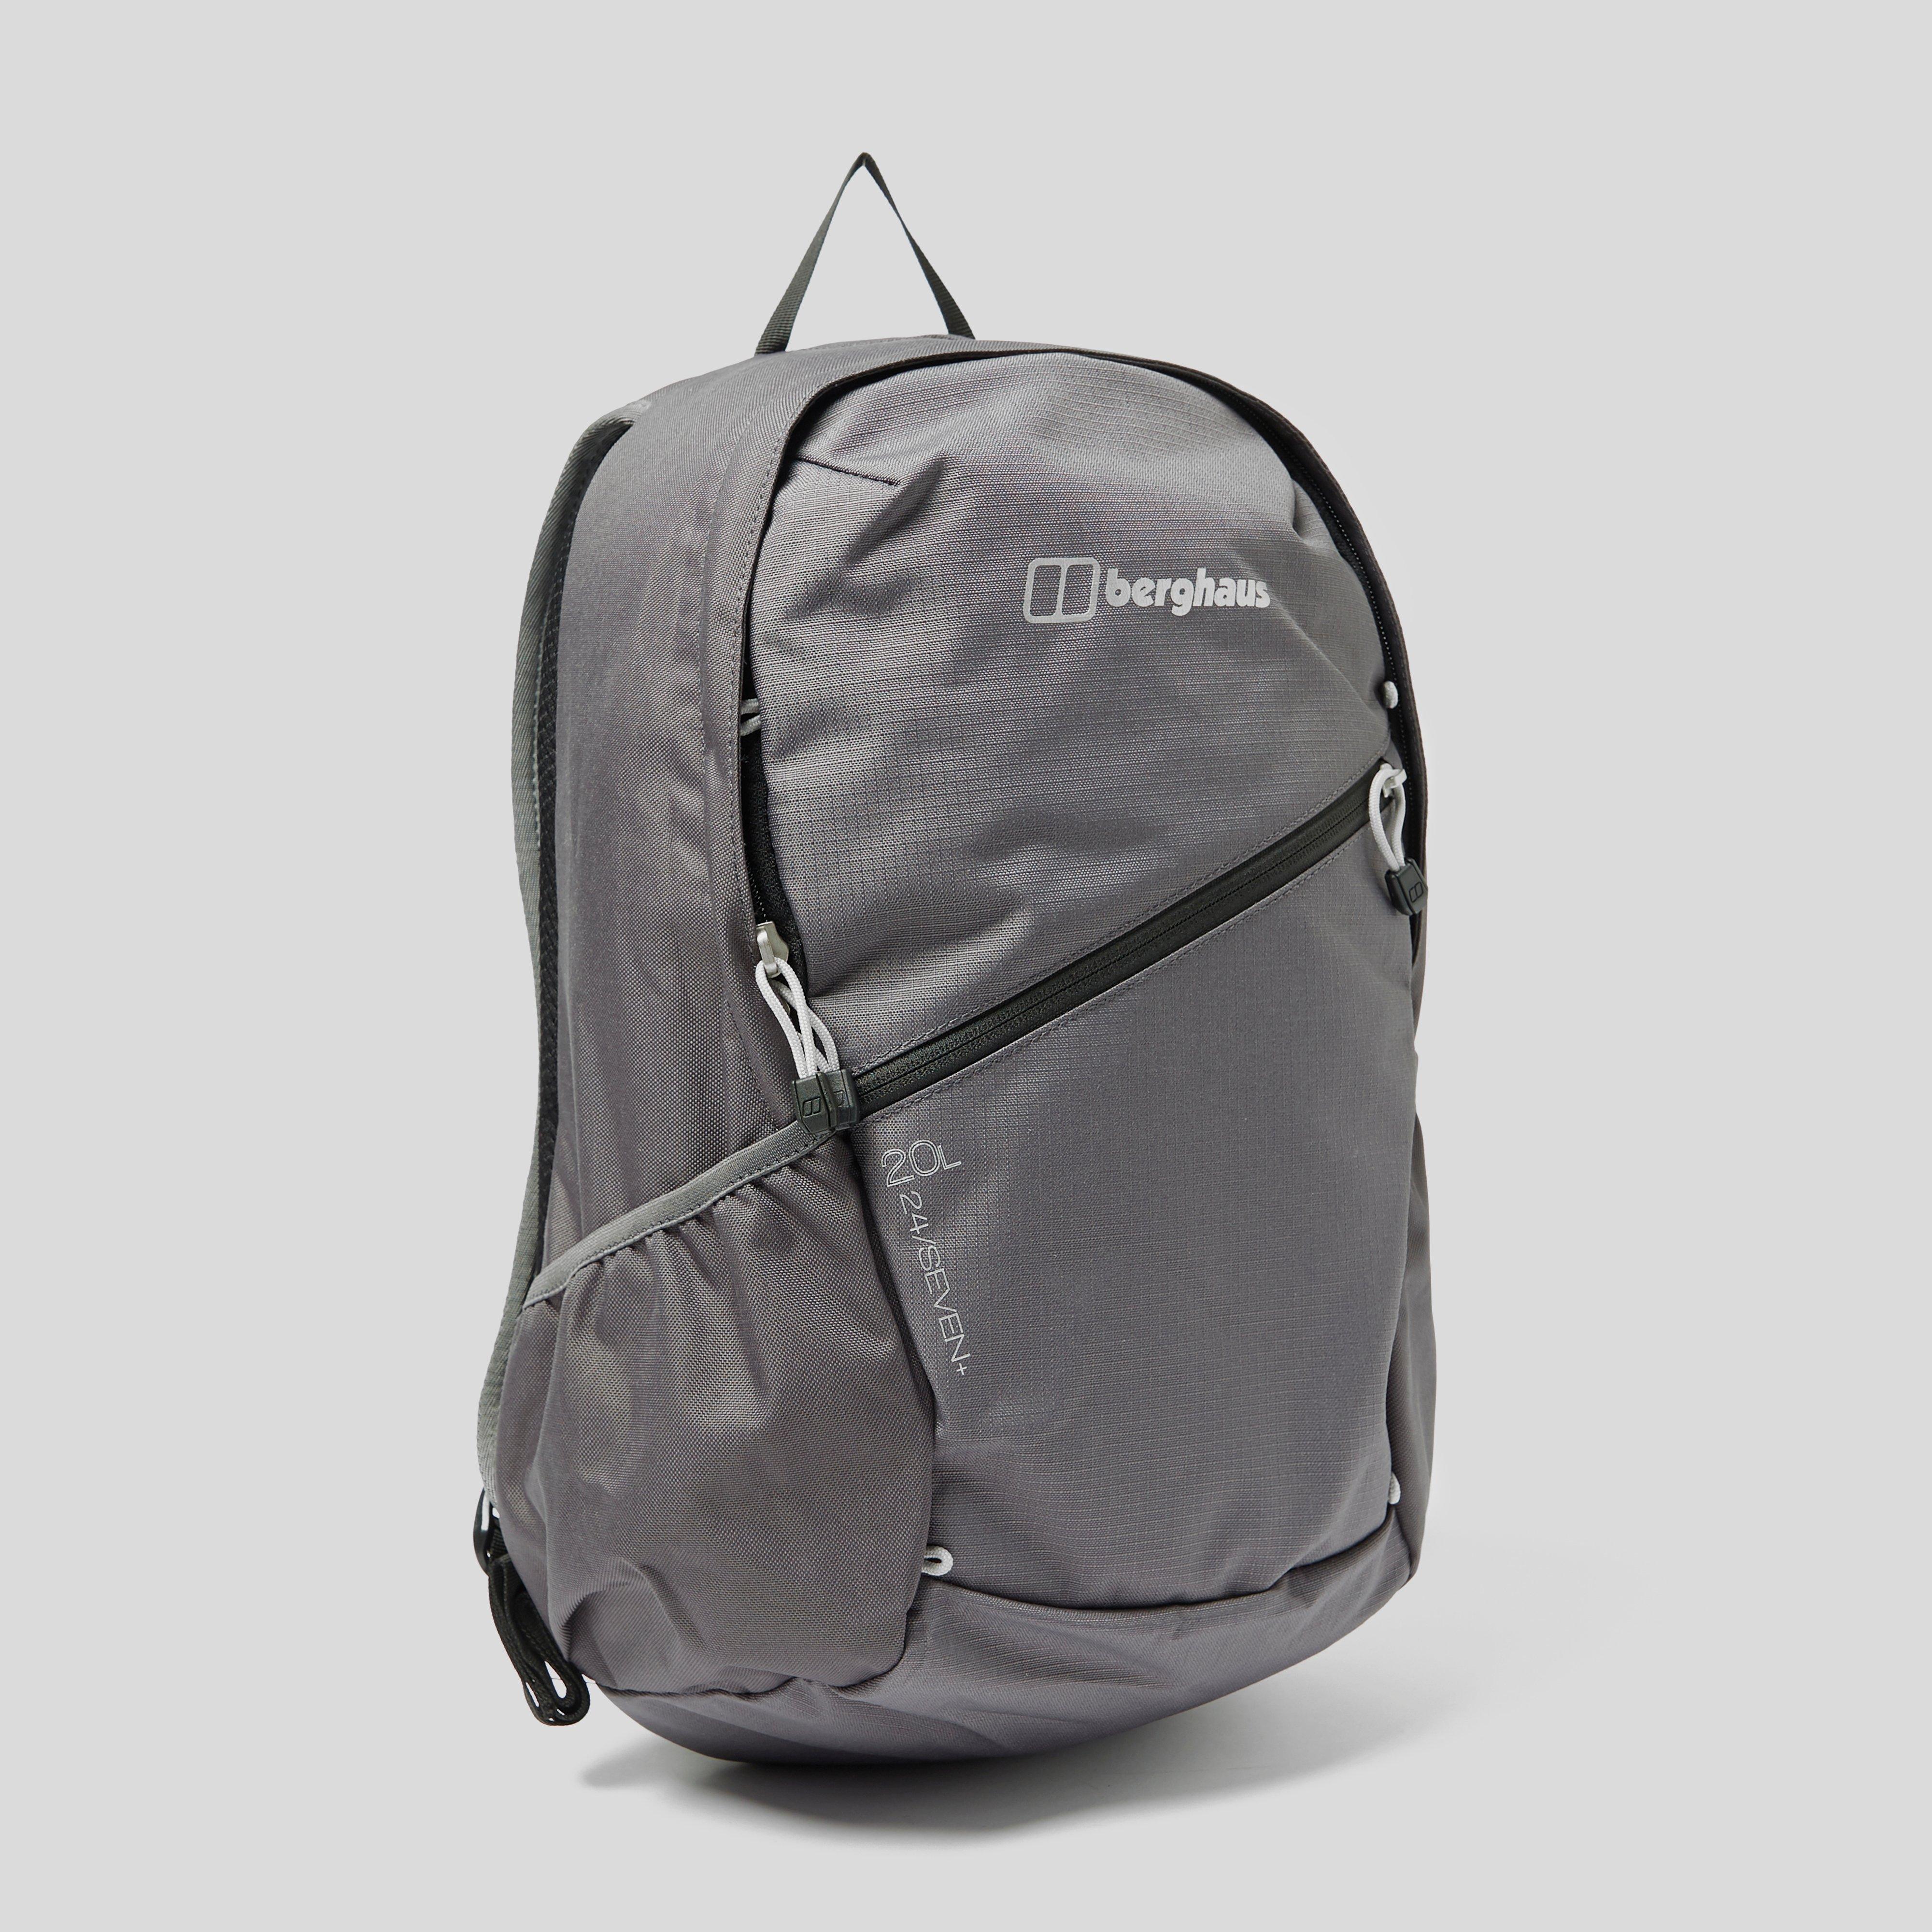 Berghaus Twentyfourseven 20l Daysack - Grey/dgy  Grey/dgy